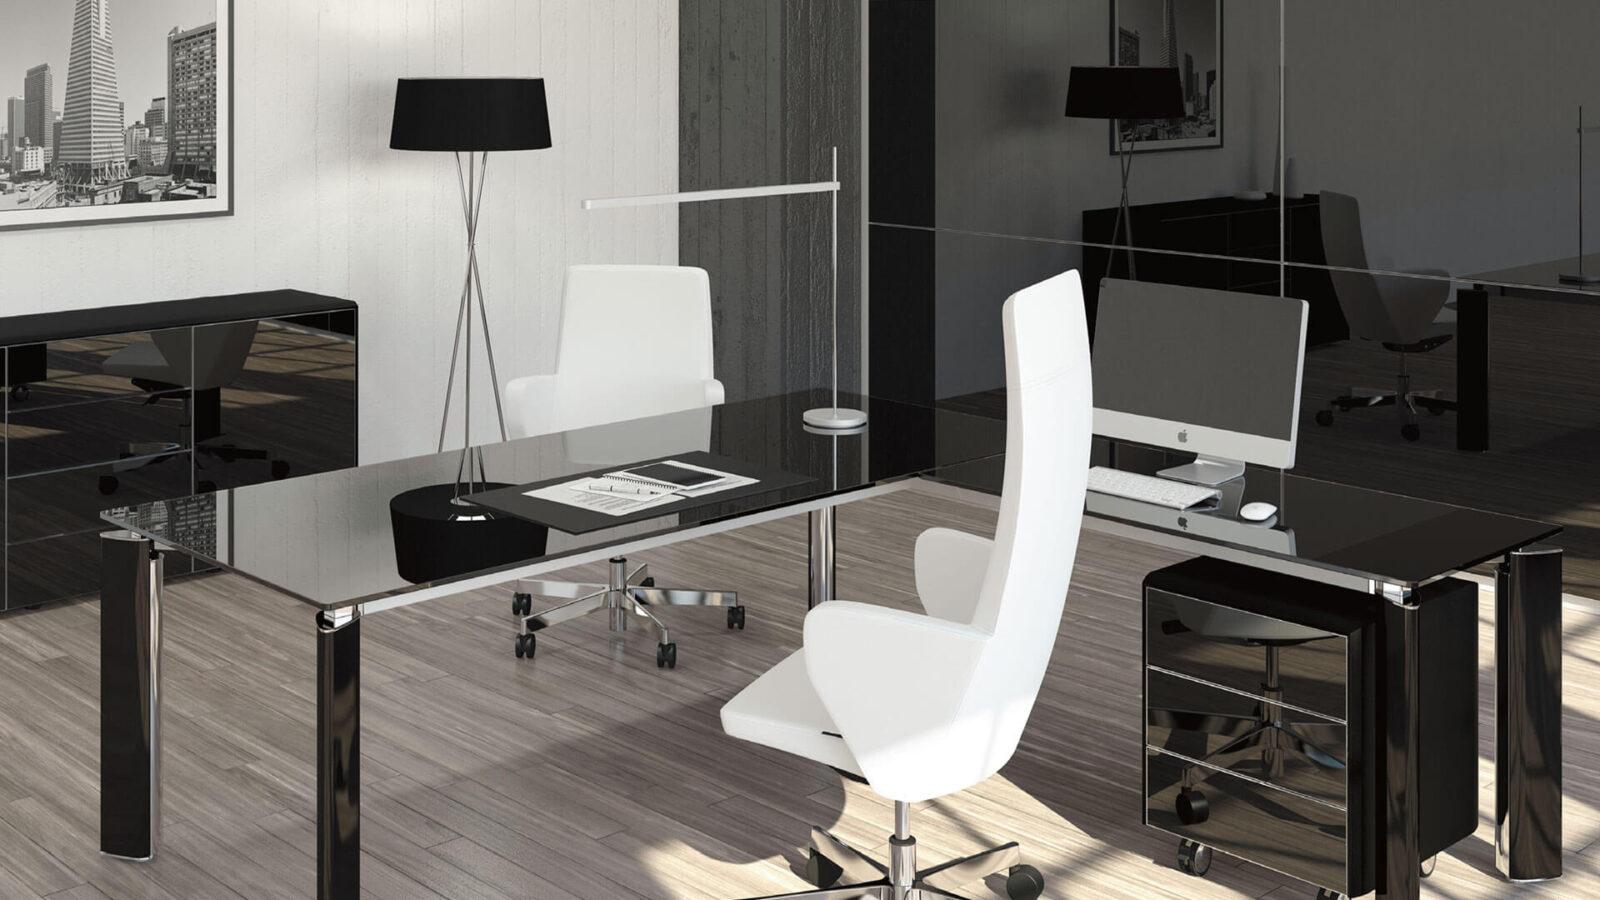 Uffici direzionali arredi mobili per ufficio torino adv eu for Mobili per ufficio torino